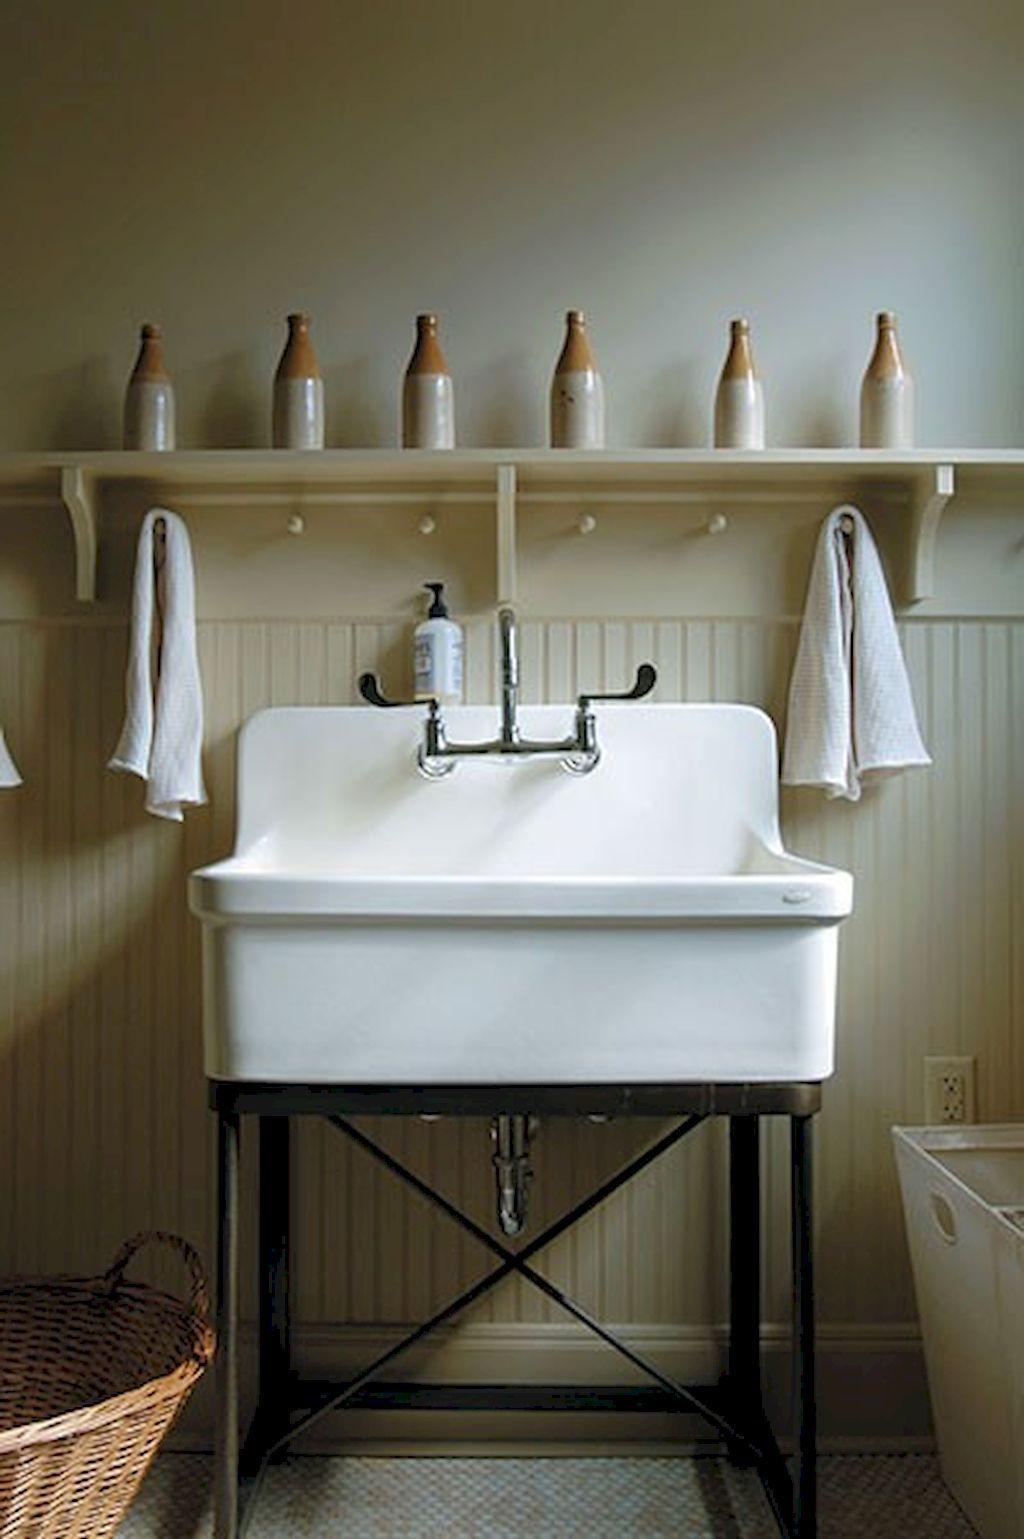 Plafonnier Salle De Bain Brico Depot ~ Nice 80 Rustic Laundry Room Decor Ideas Https Crowdecor Com 80